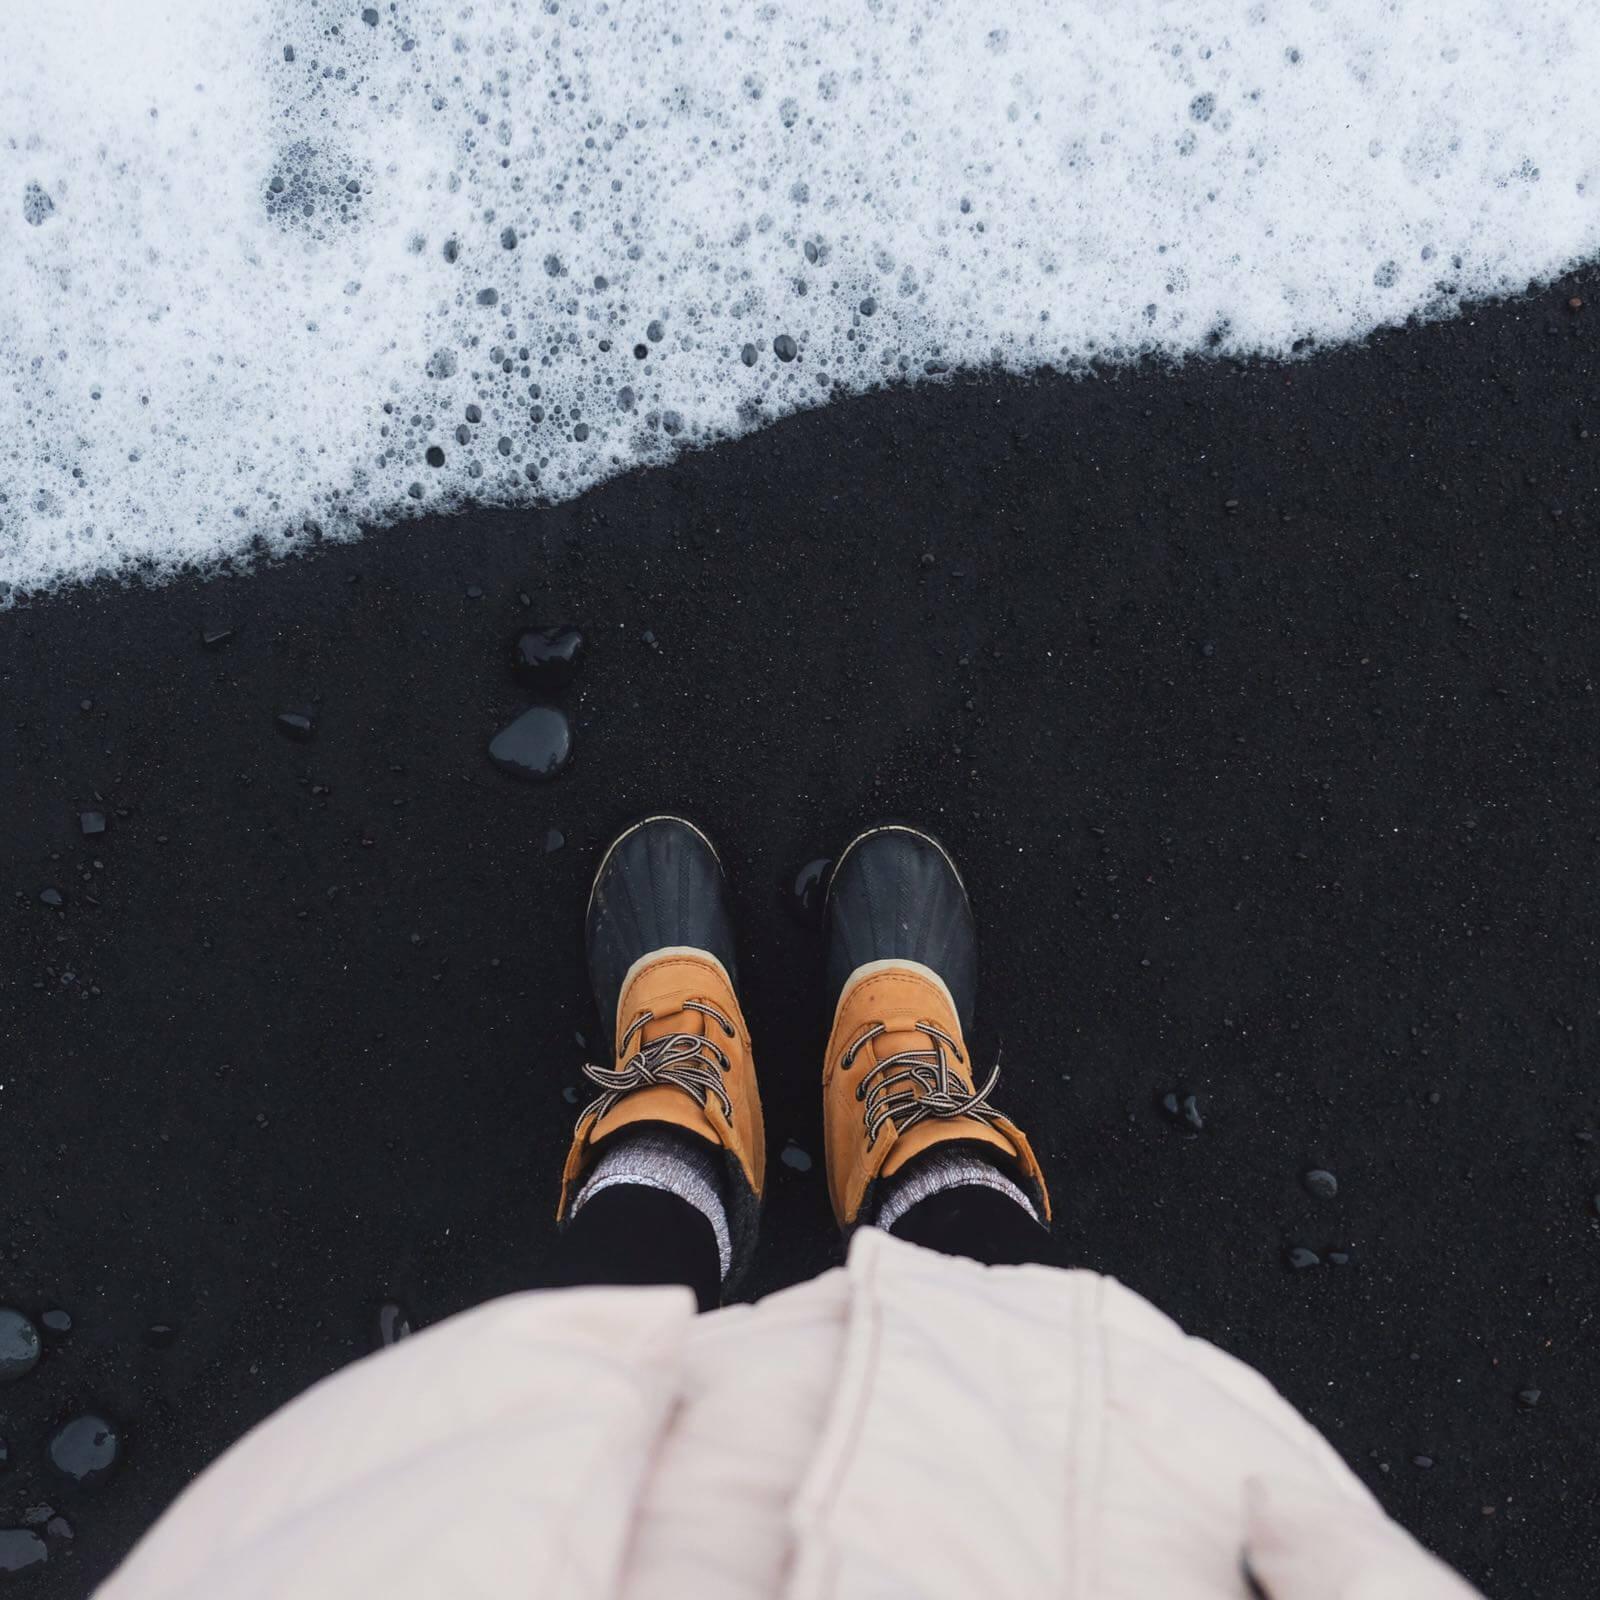 SOREL Boots on Black Sand Beach